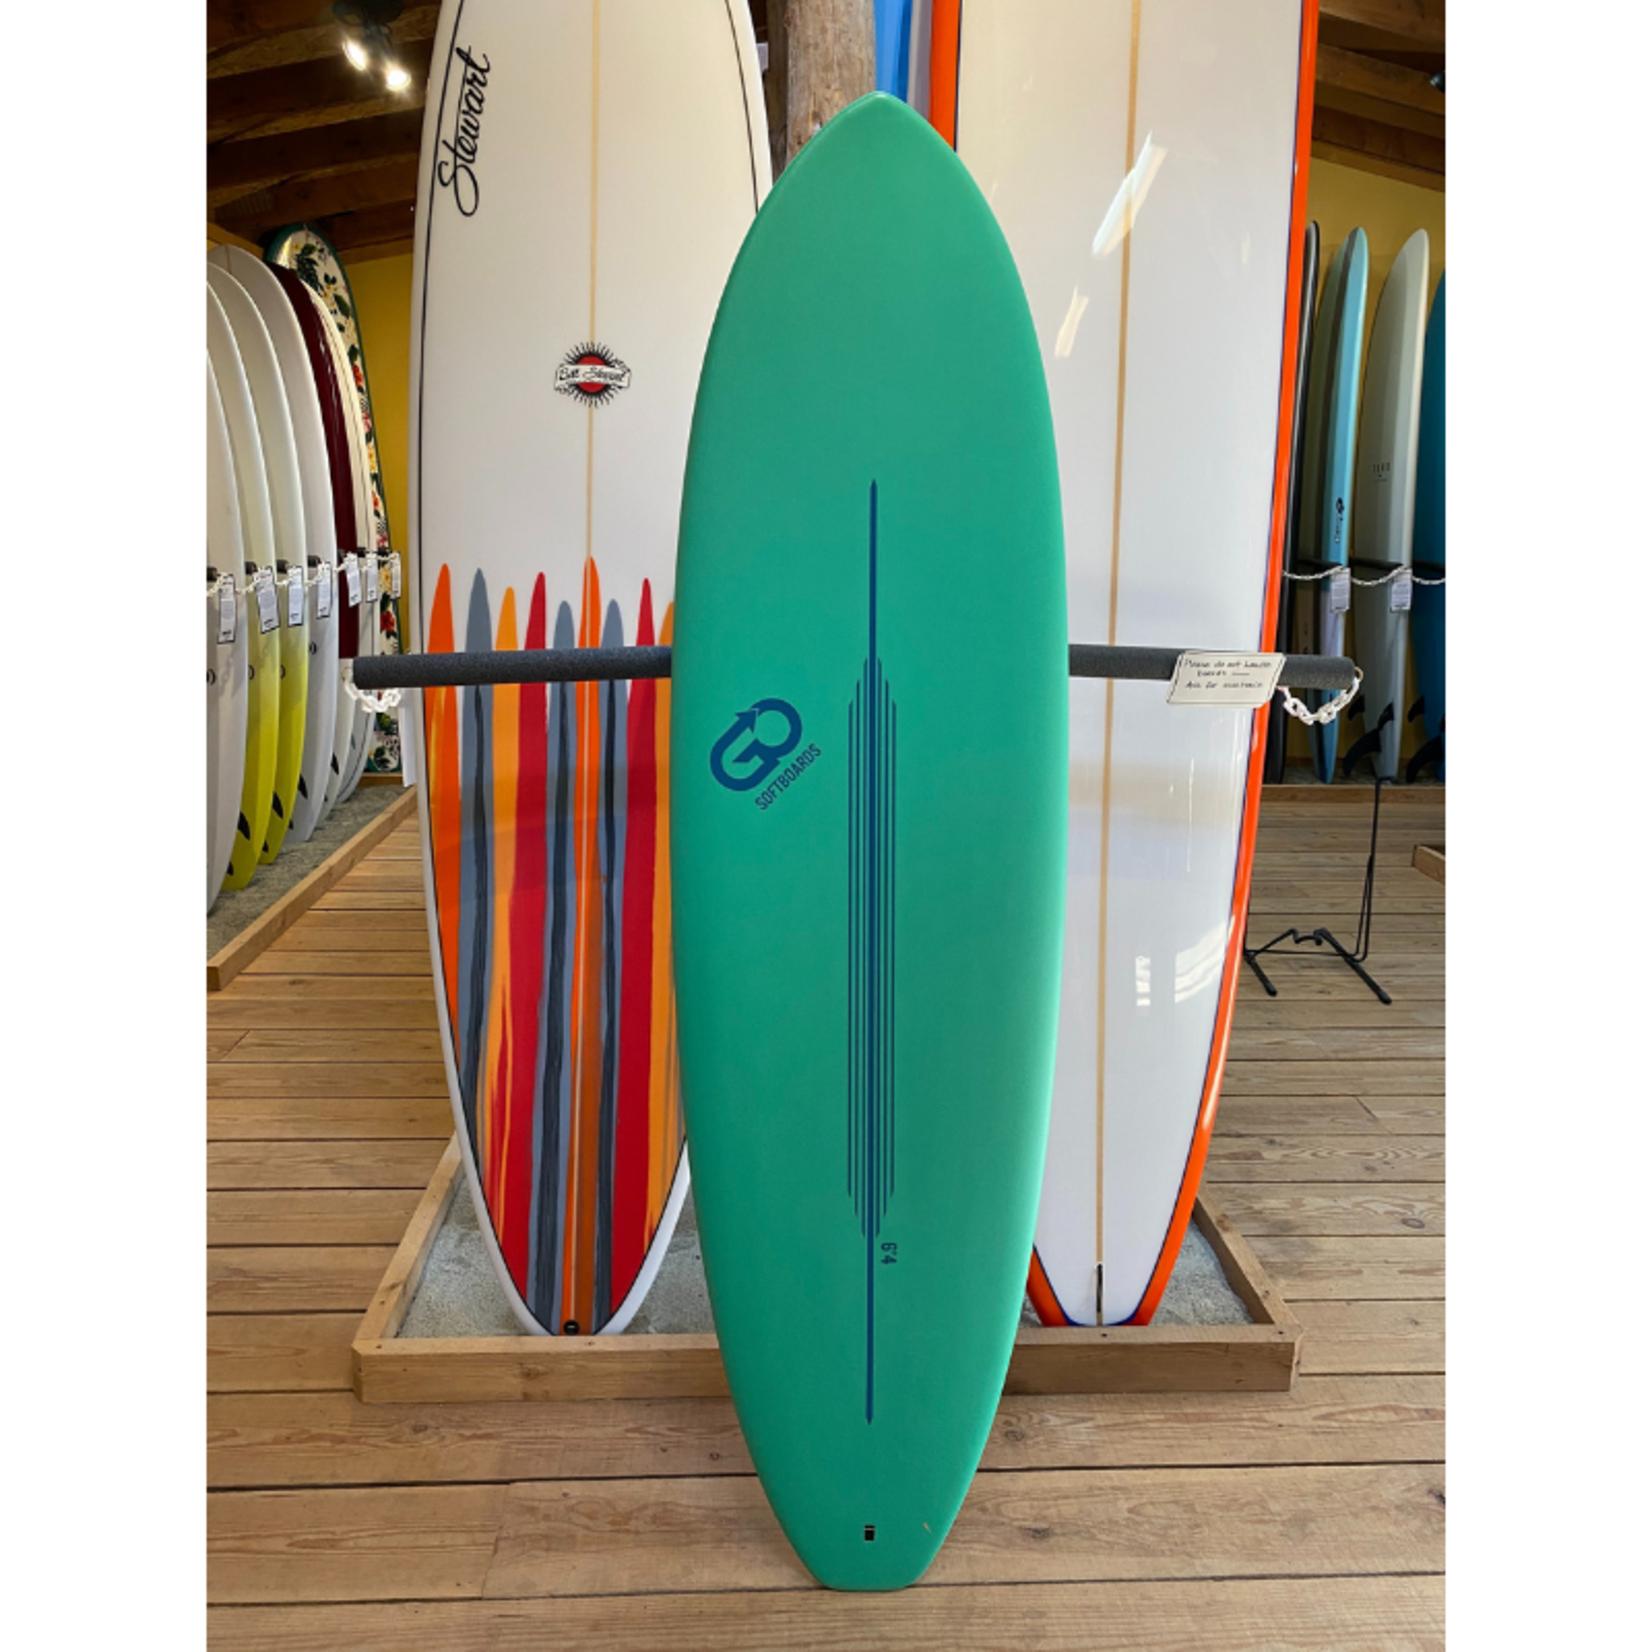 TORQ Surfboards 6'4 Torq GO Green/White Soft Deck